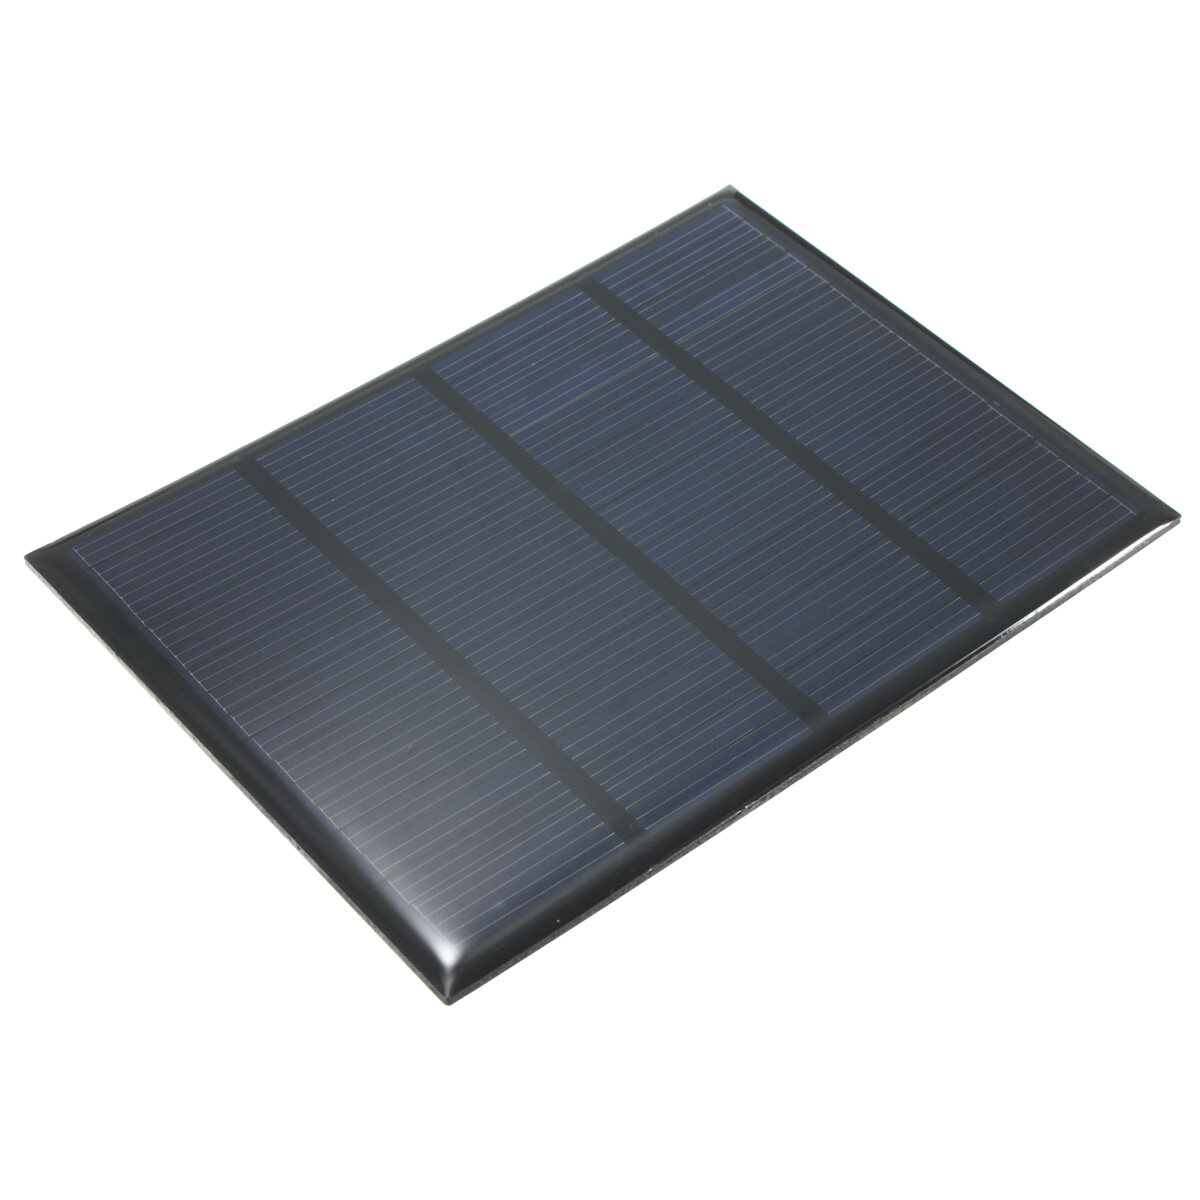 Solar Panel 12v 100ma 1 5w Small Solar Cell Black Lazada